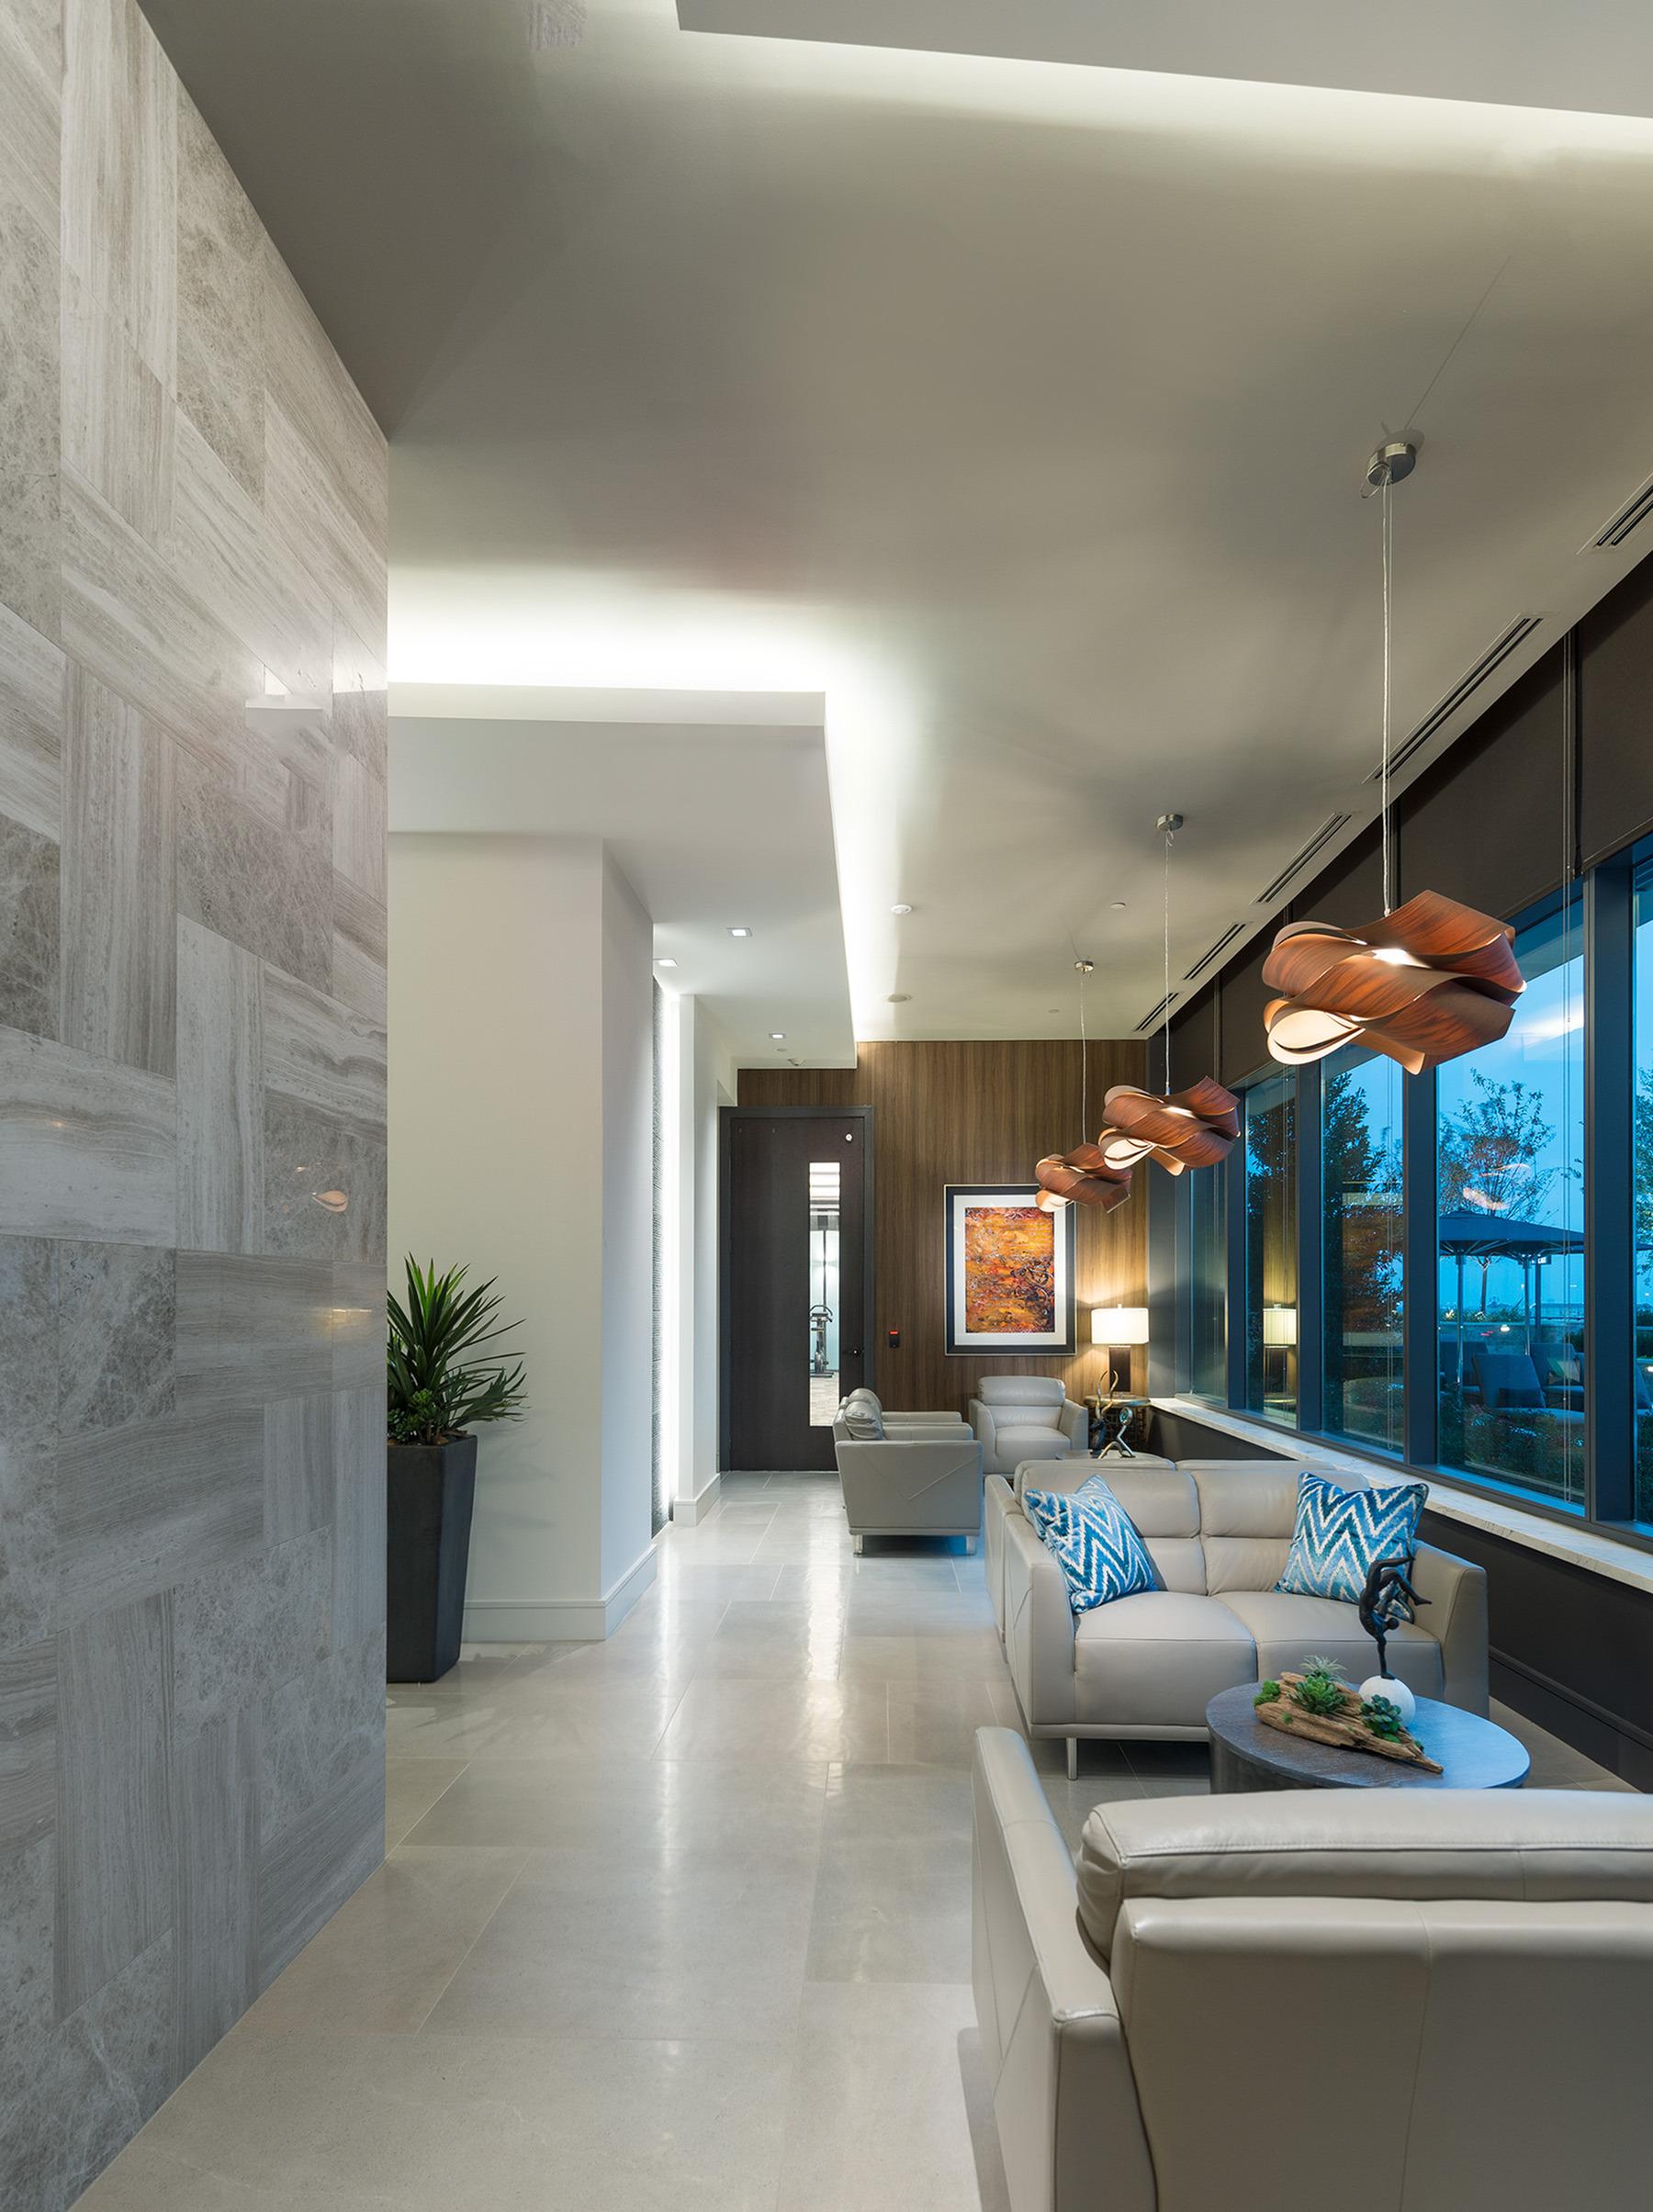 Pool-side aqua lounge at Hanover Montrose